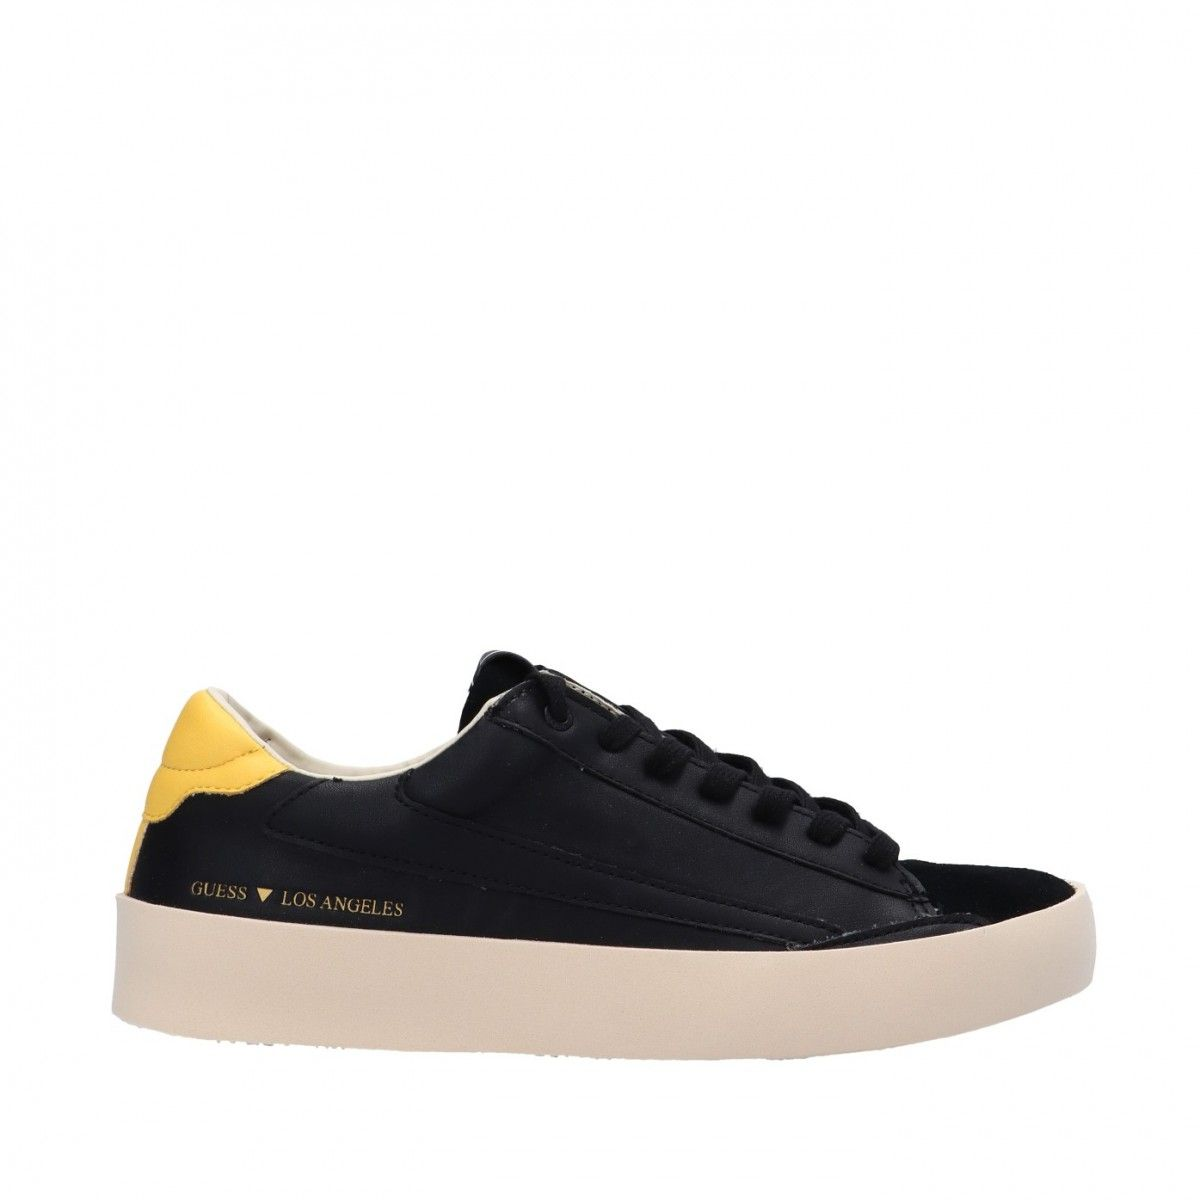 Guess Sneaker Nero/giallo...